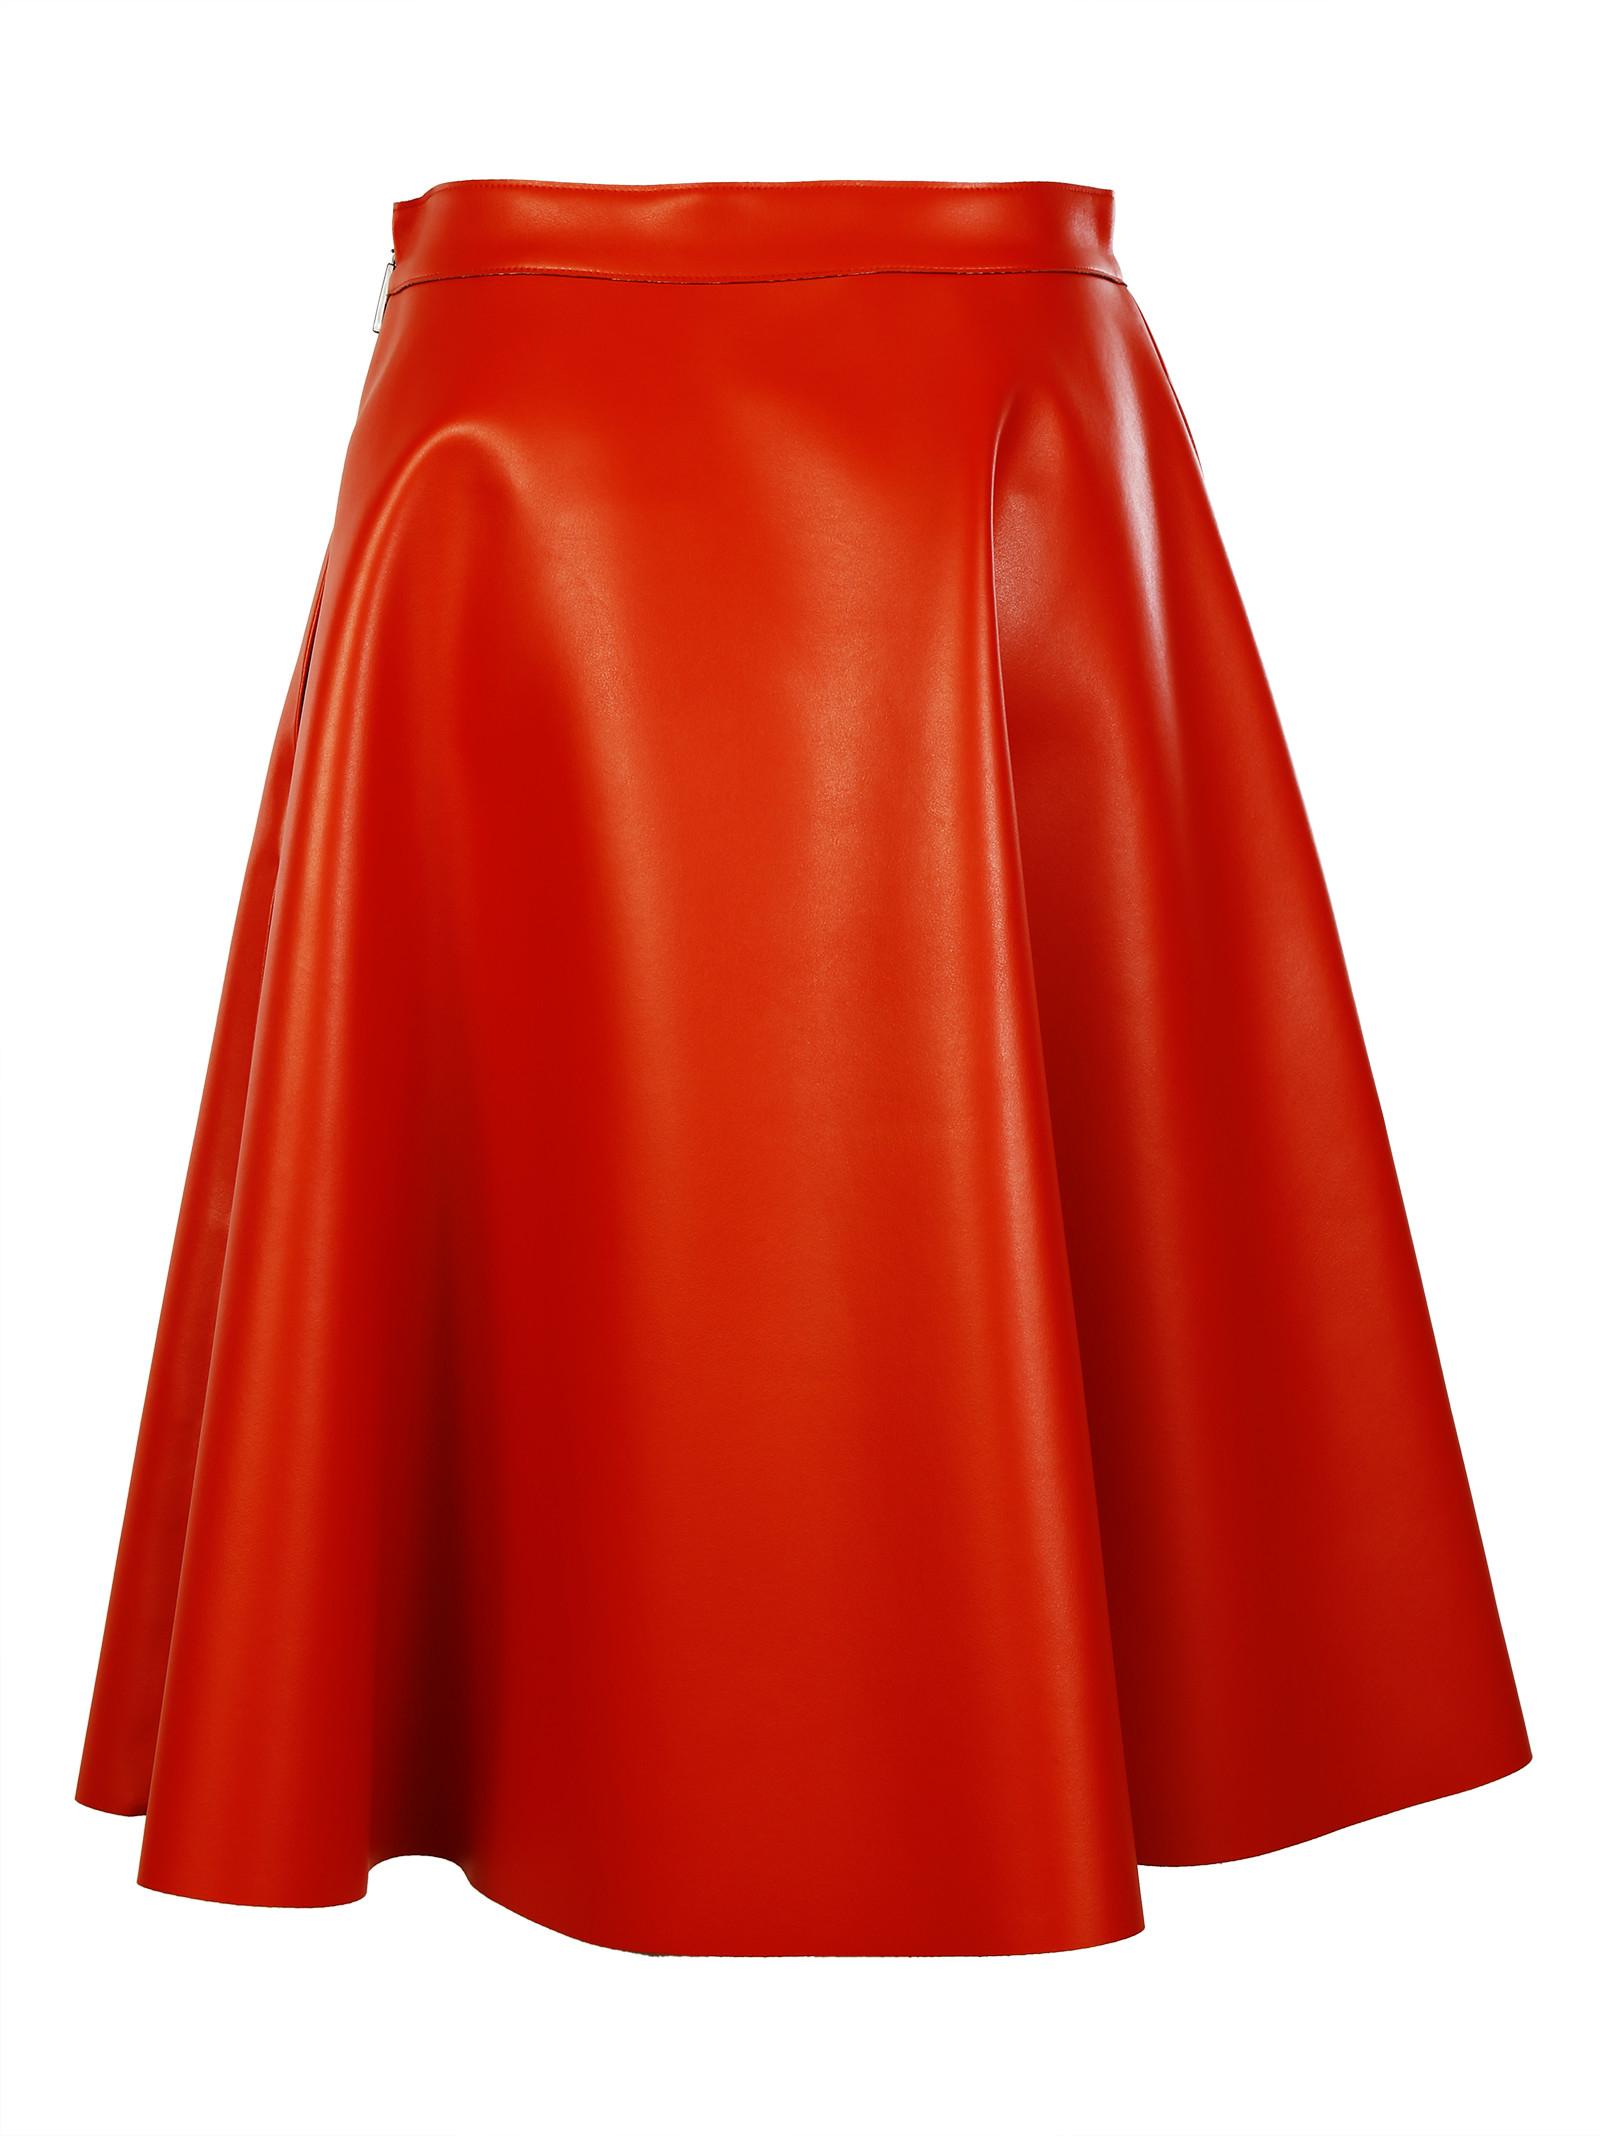 msgm similar leather skirt in orange lyst